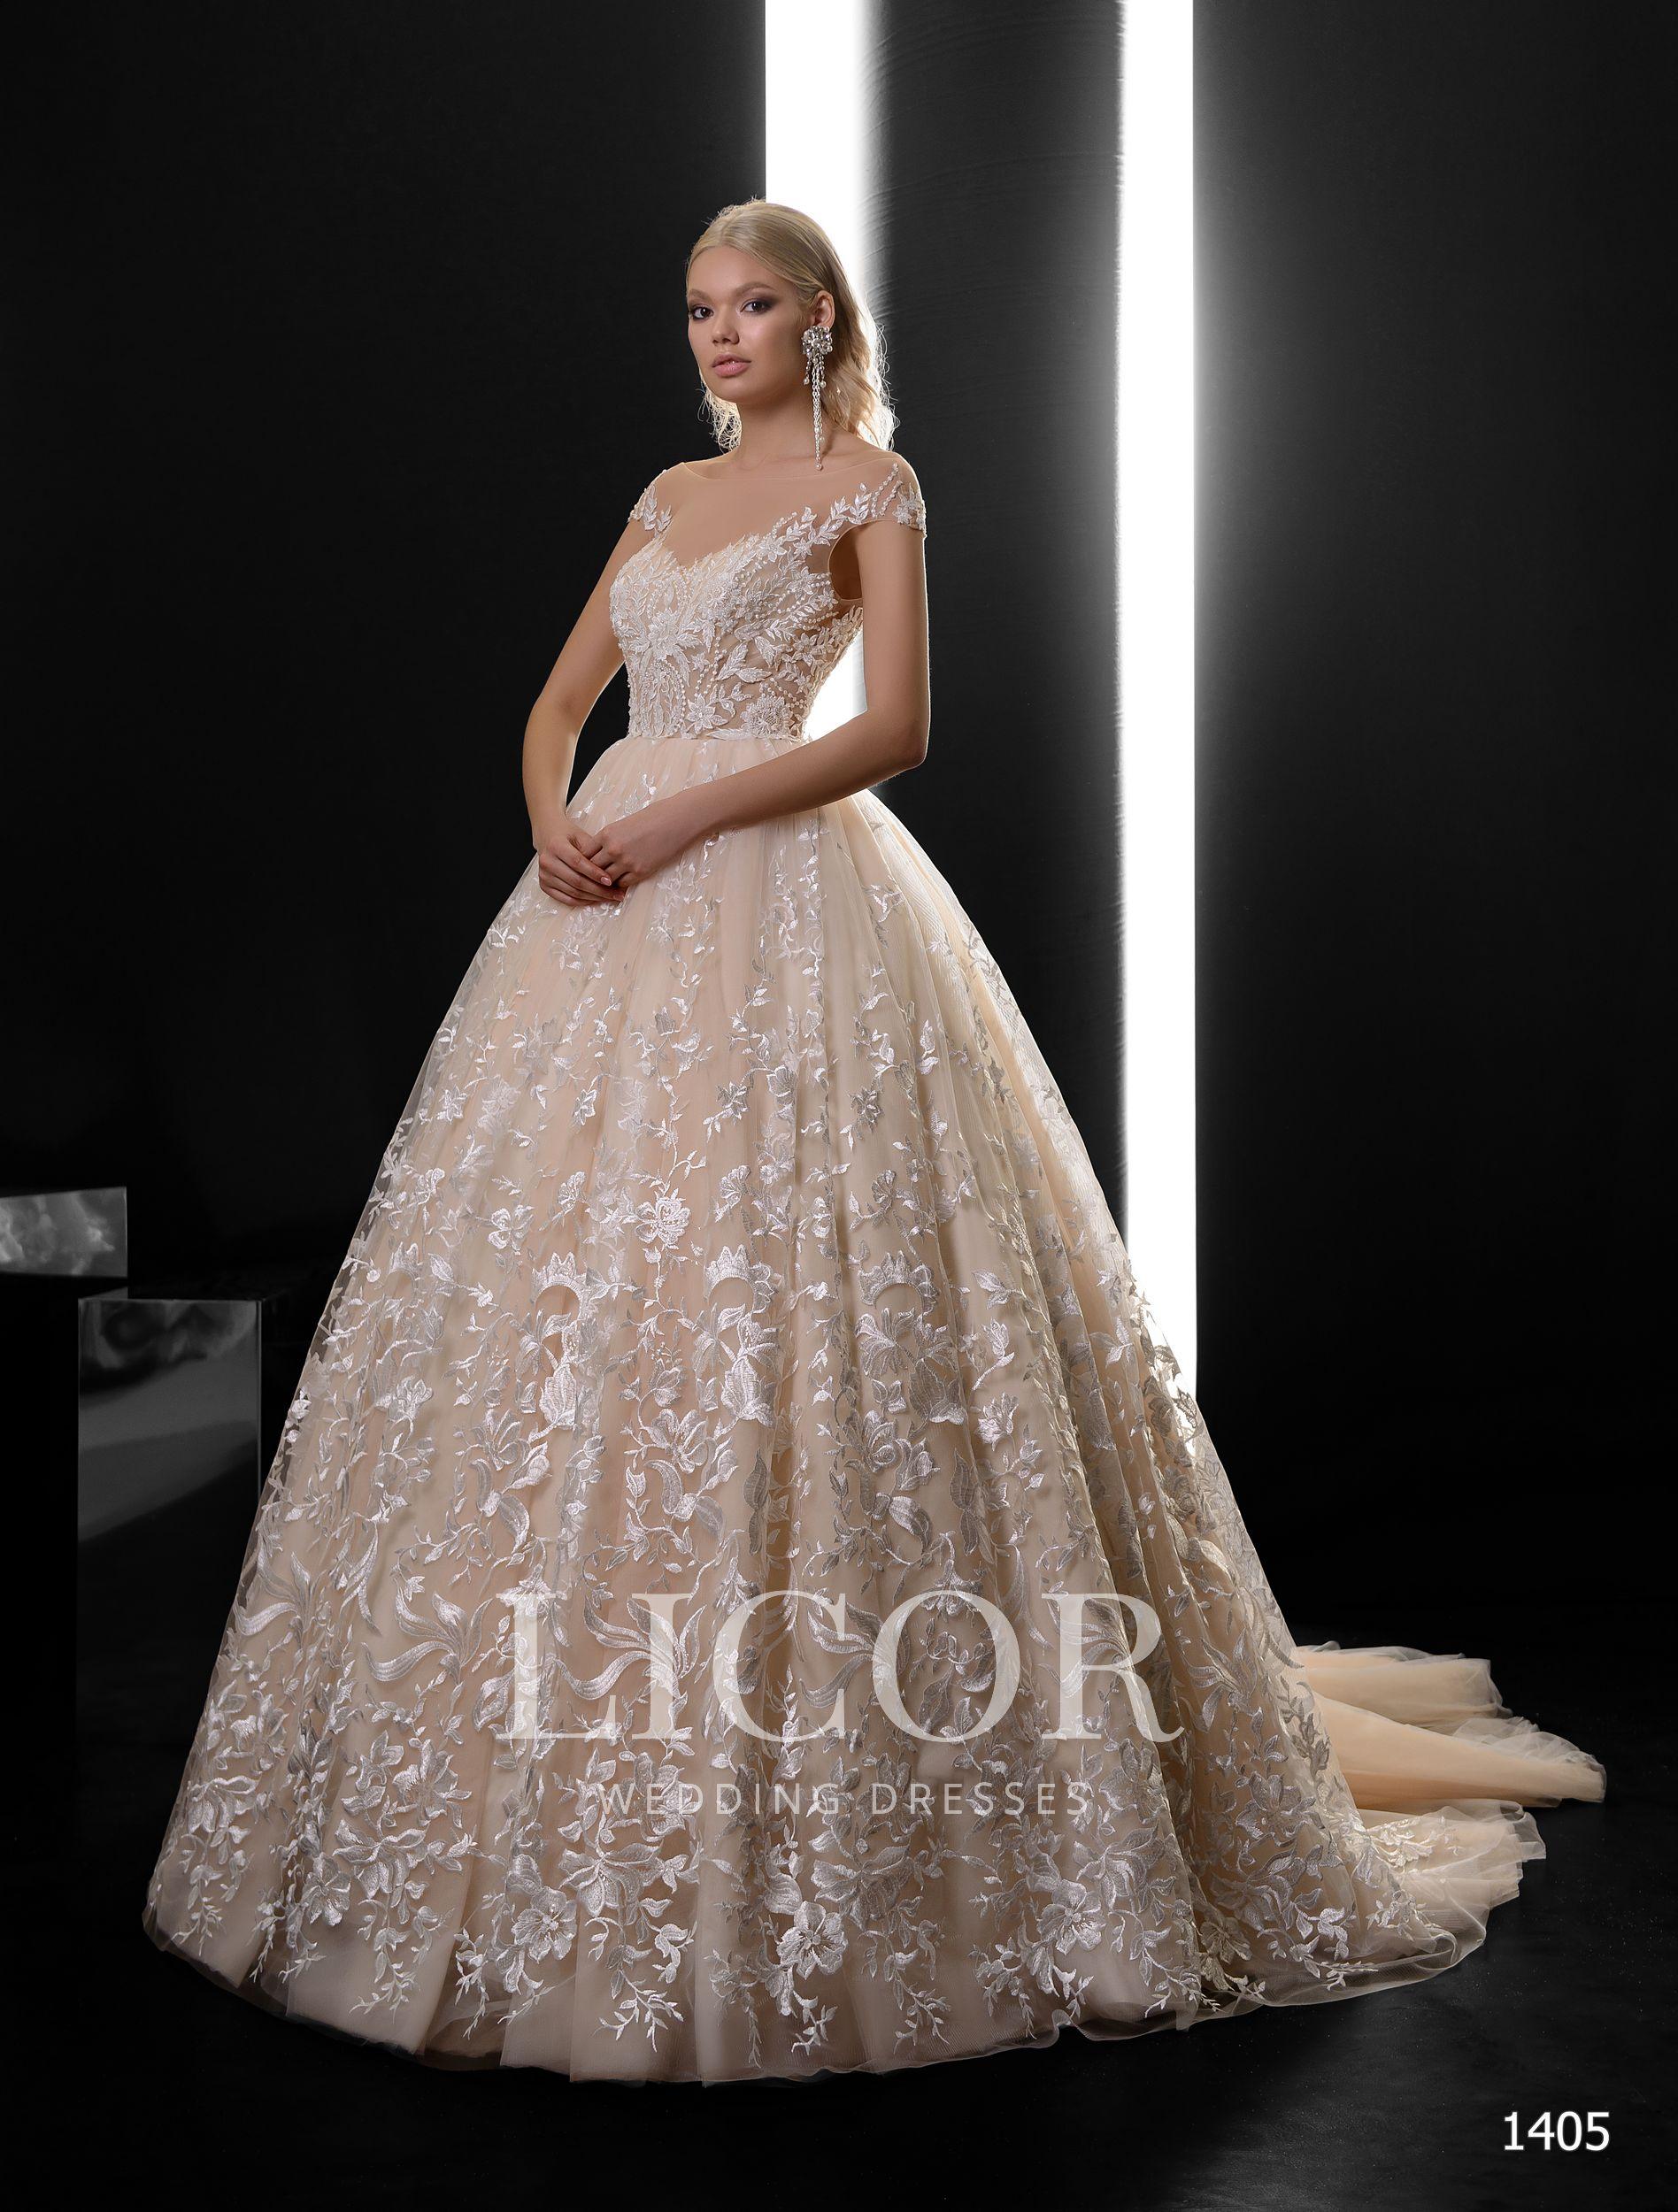 http://licor.com.ua/images/stories/virtuemart/product/1405(1).jpg